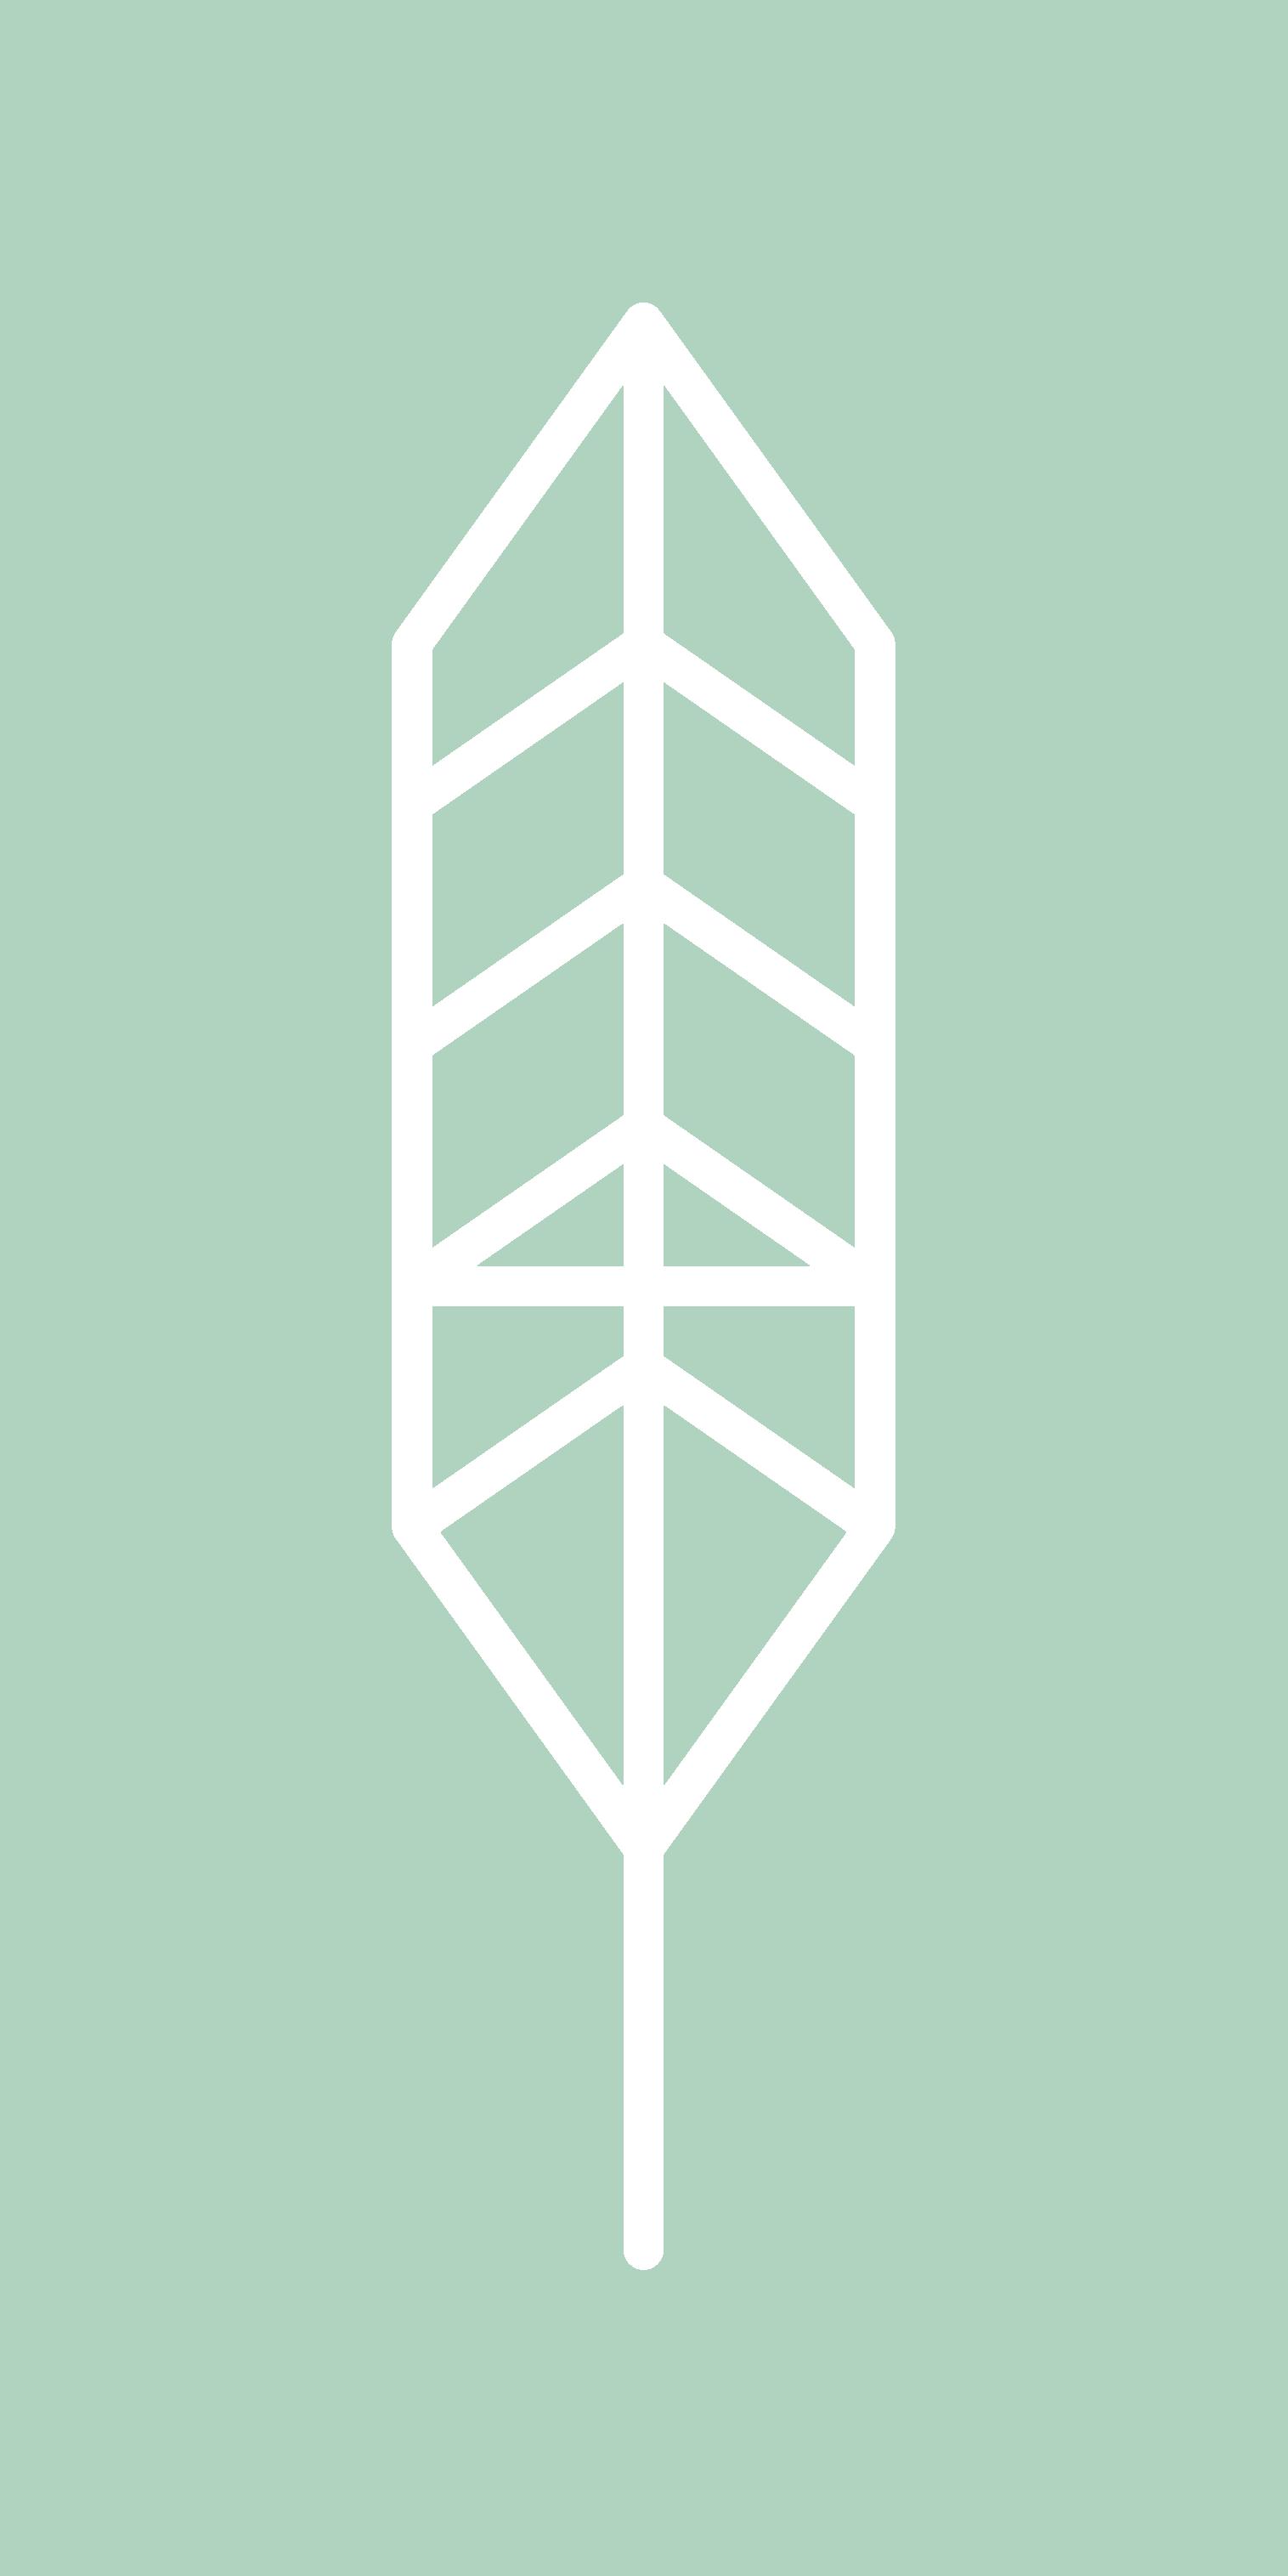 Leaf_in_box_Green